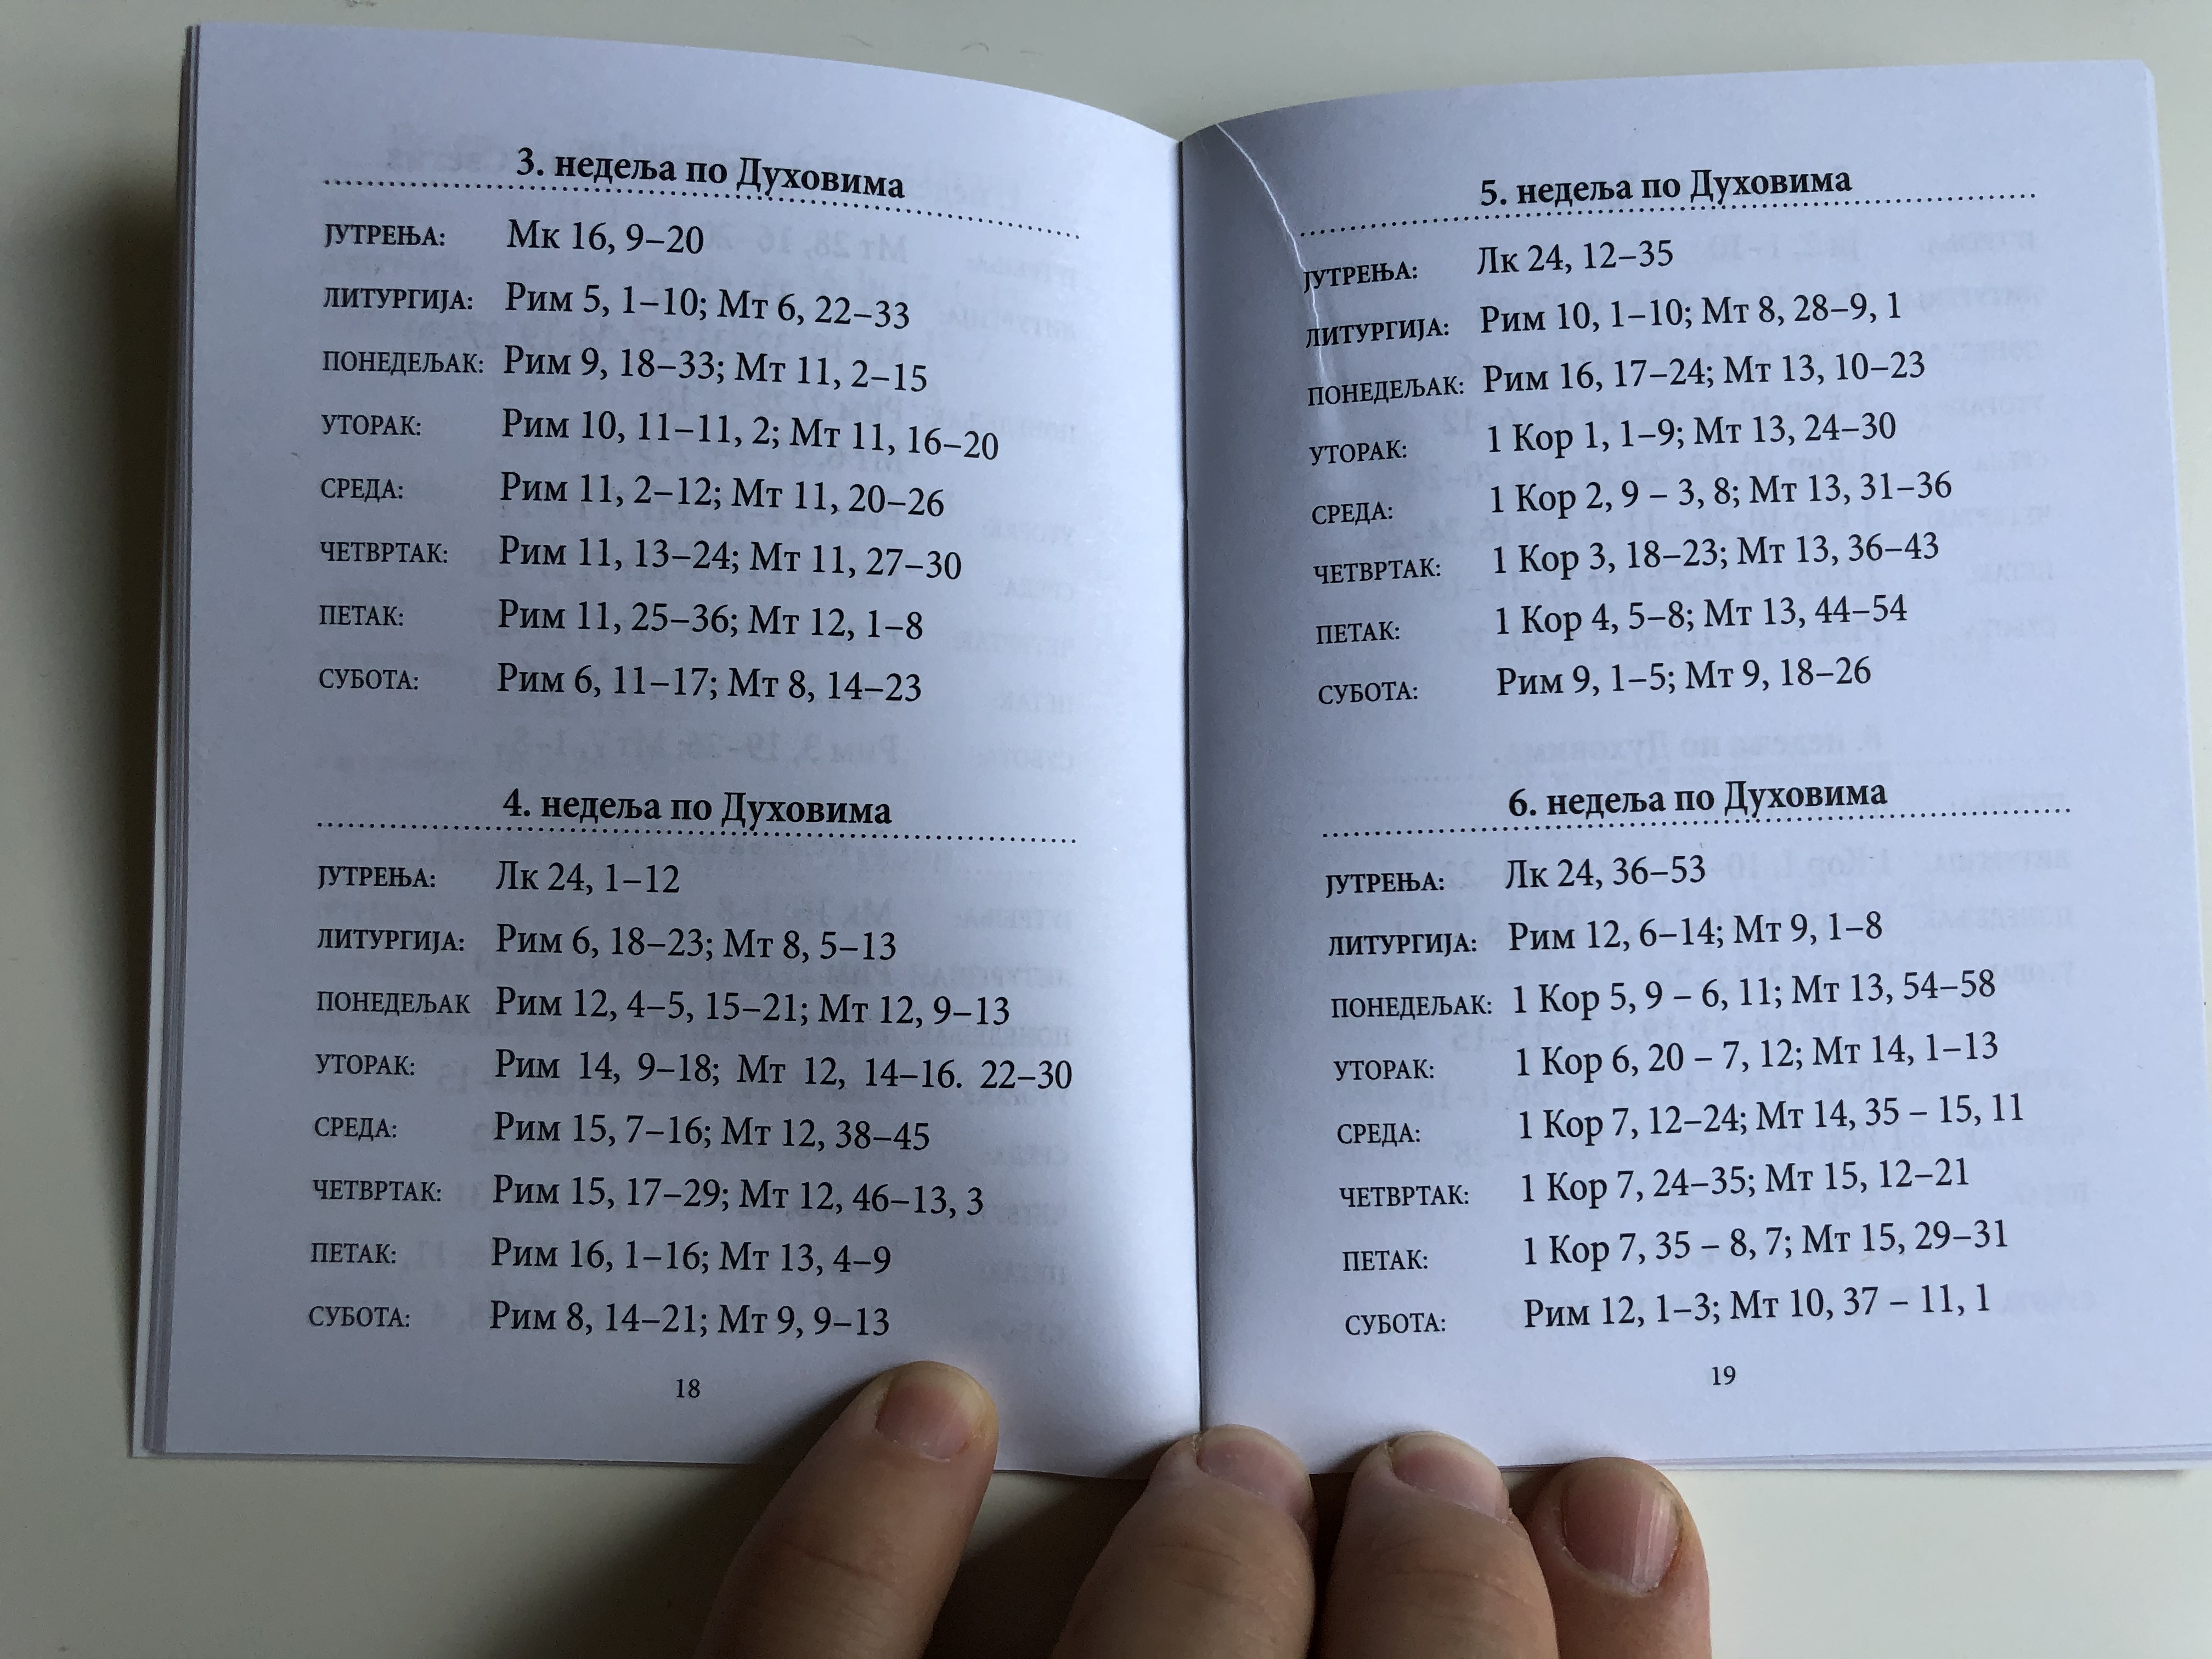 svakodnevna-jevan-elska-i-apostolska-itanja-by-proto-akon-radomir-raki-9.jpg